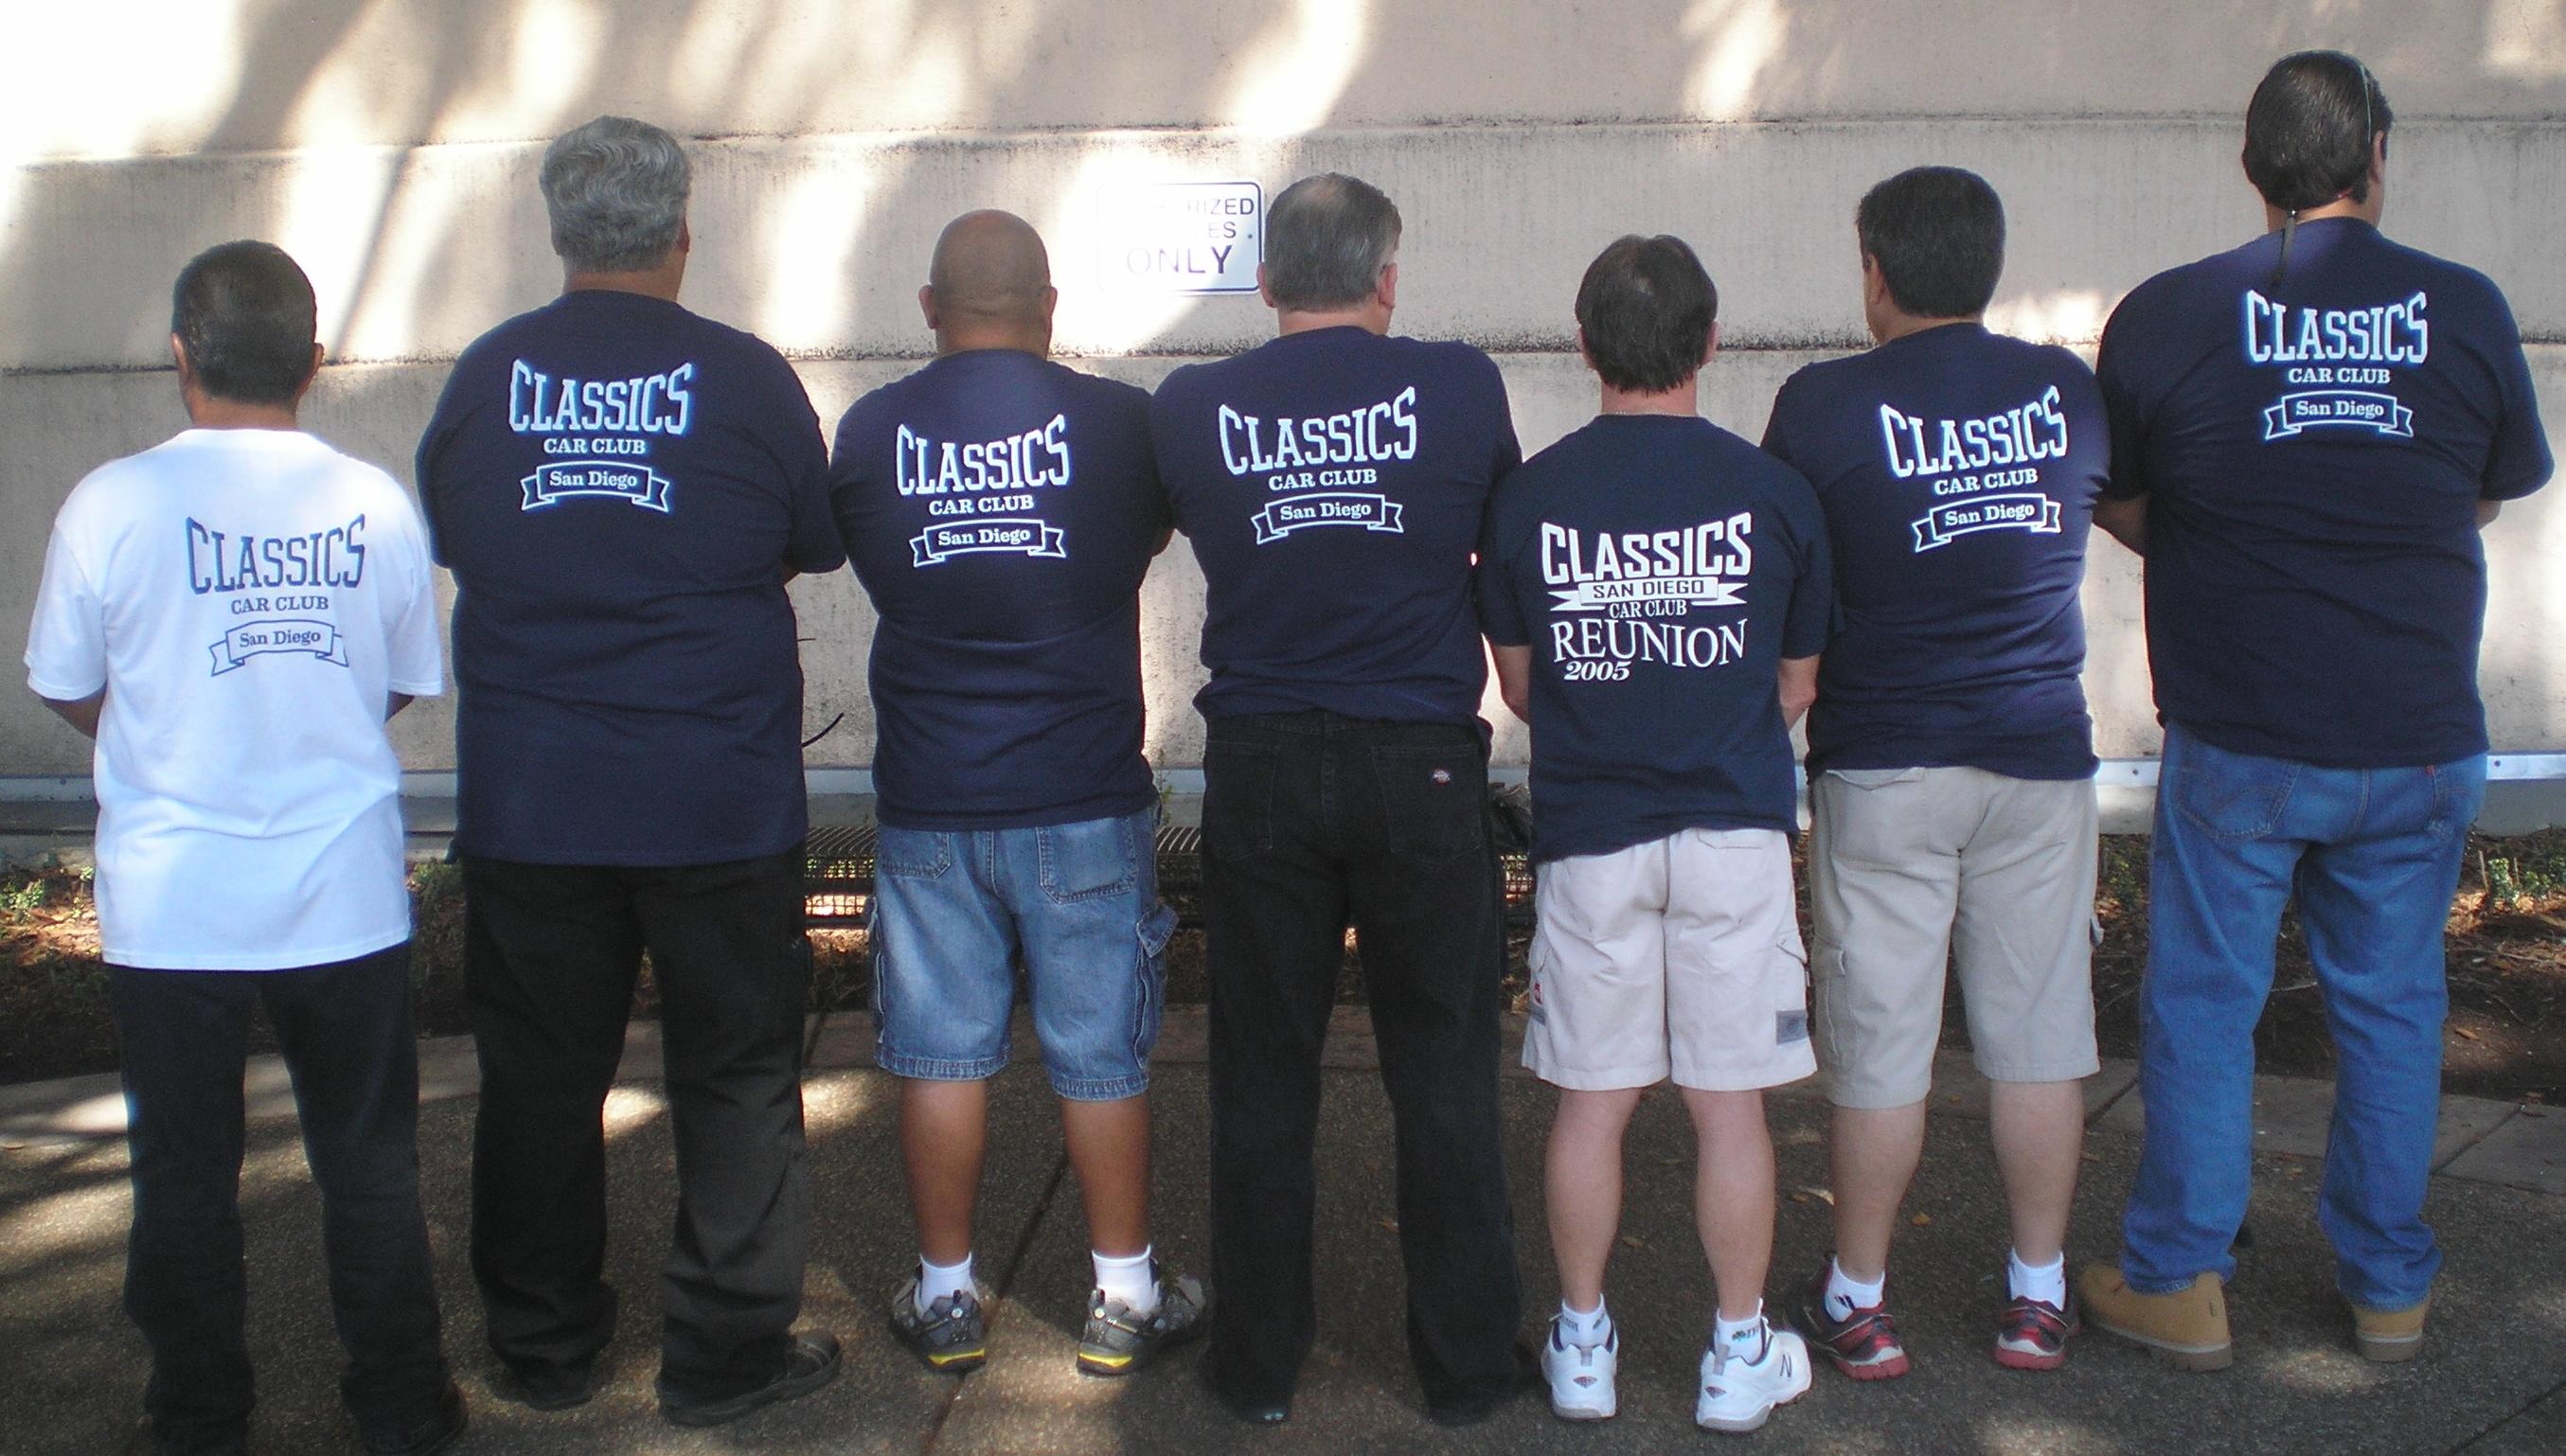 Shirt design san diego - Classics Car Club At The Museum T Shirt Photo